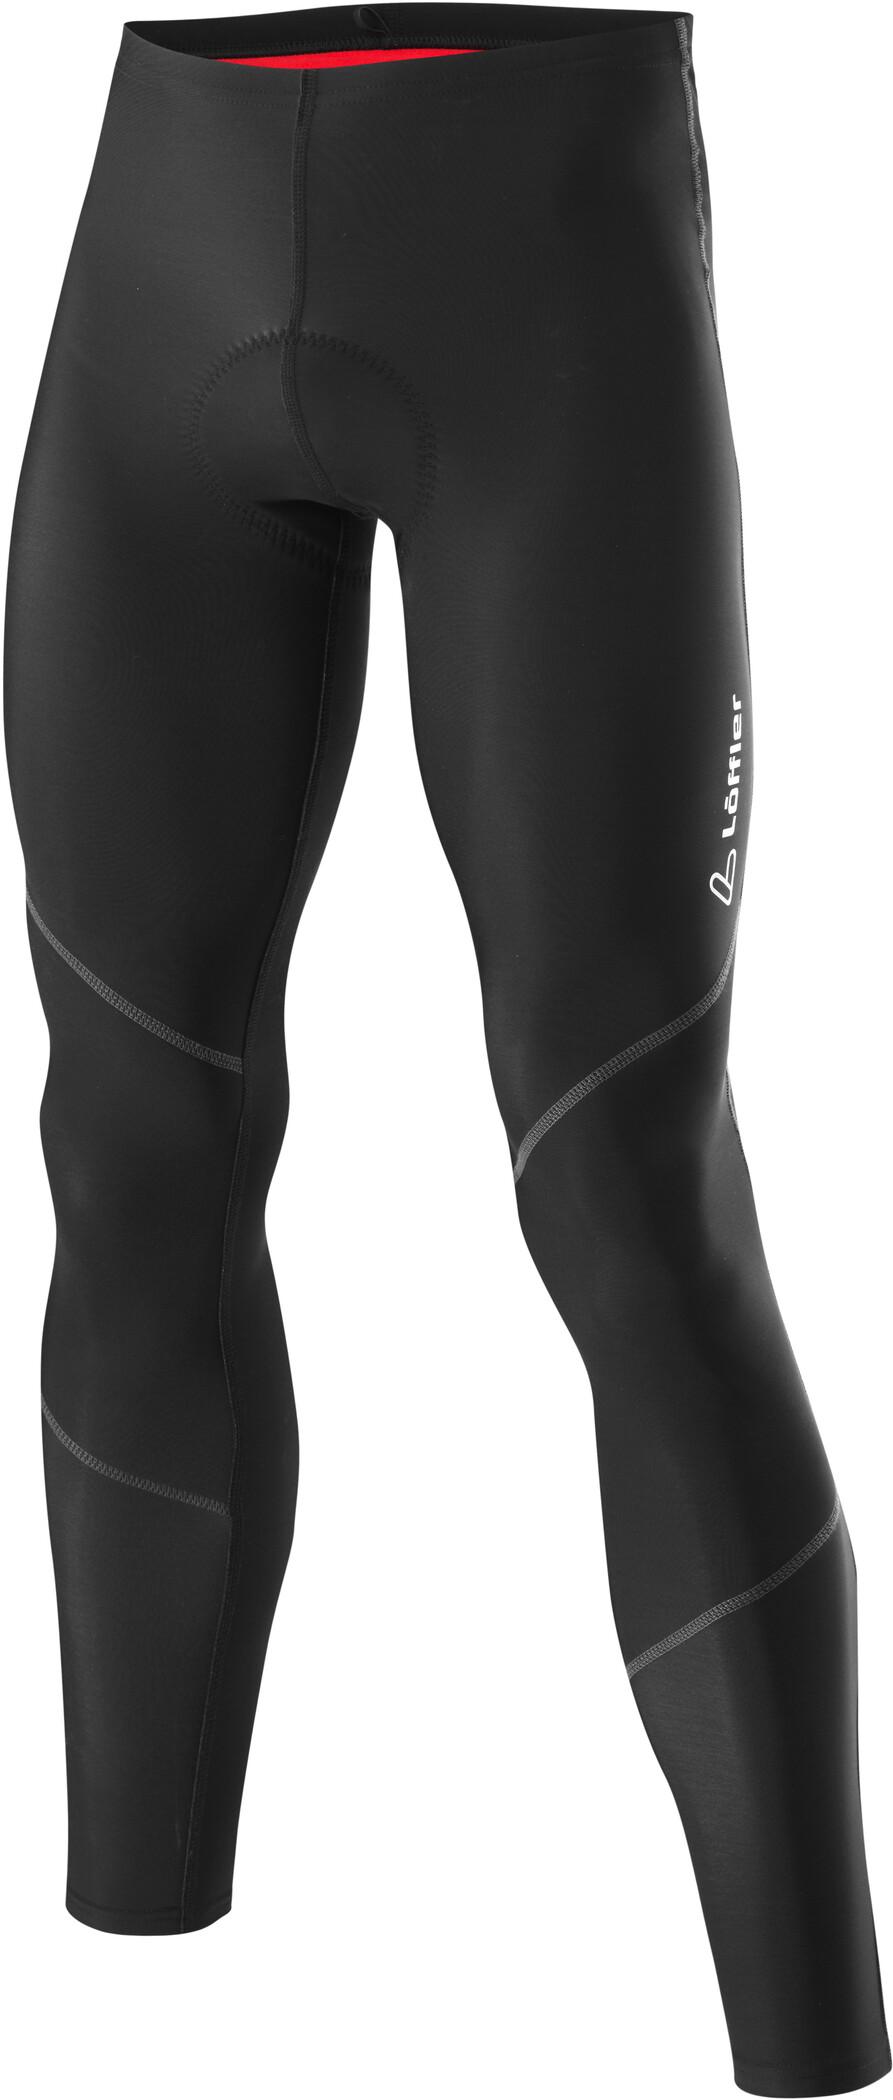 Löffler Thermo Cykelbukser Herrer, black (2019) | Trousers